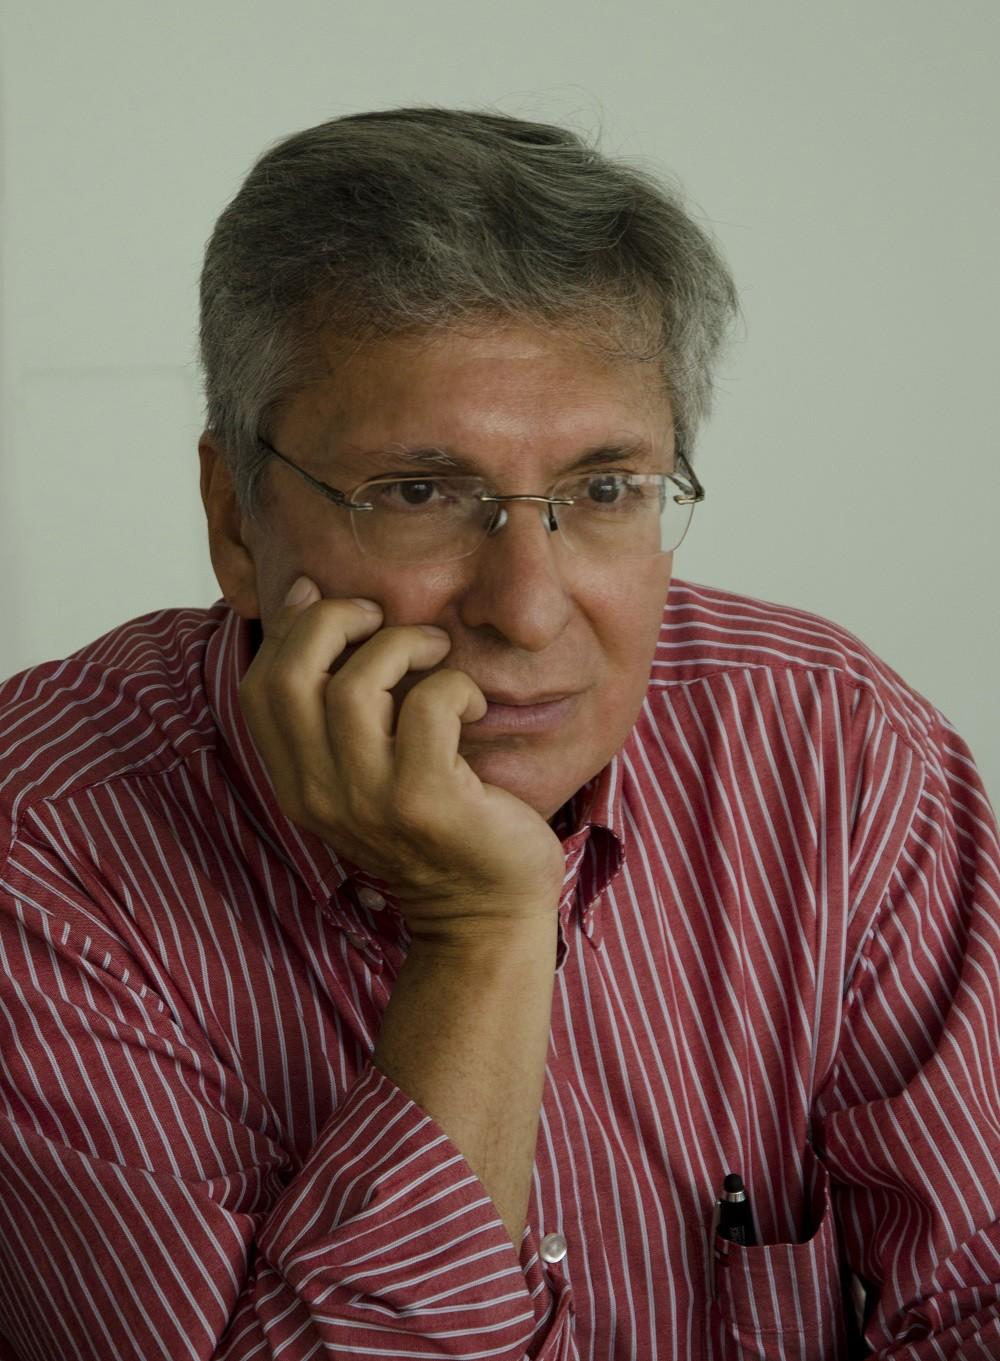 Armando Martínez Garnica